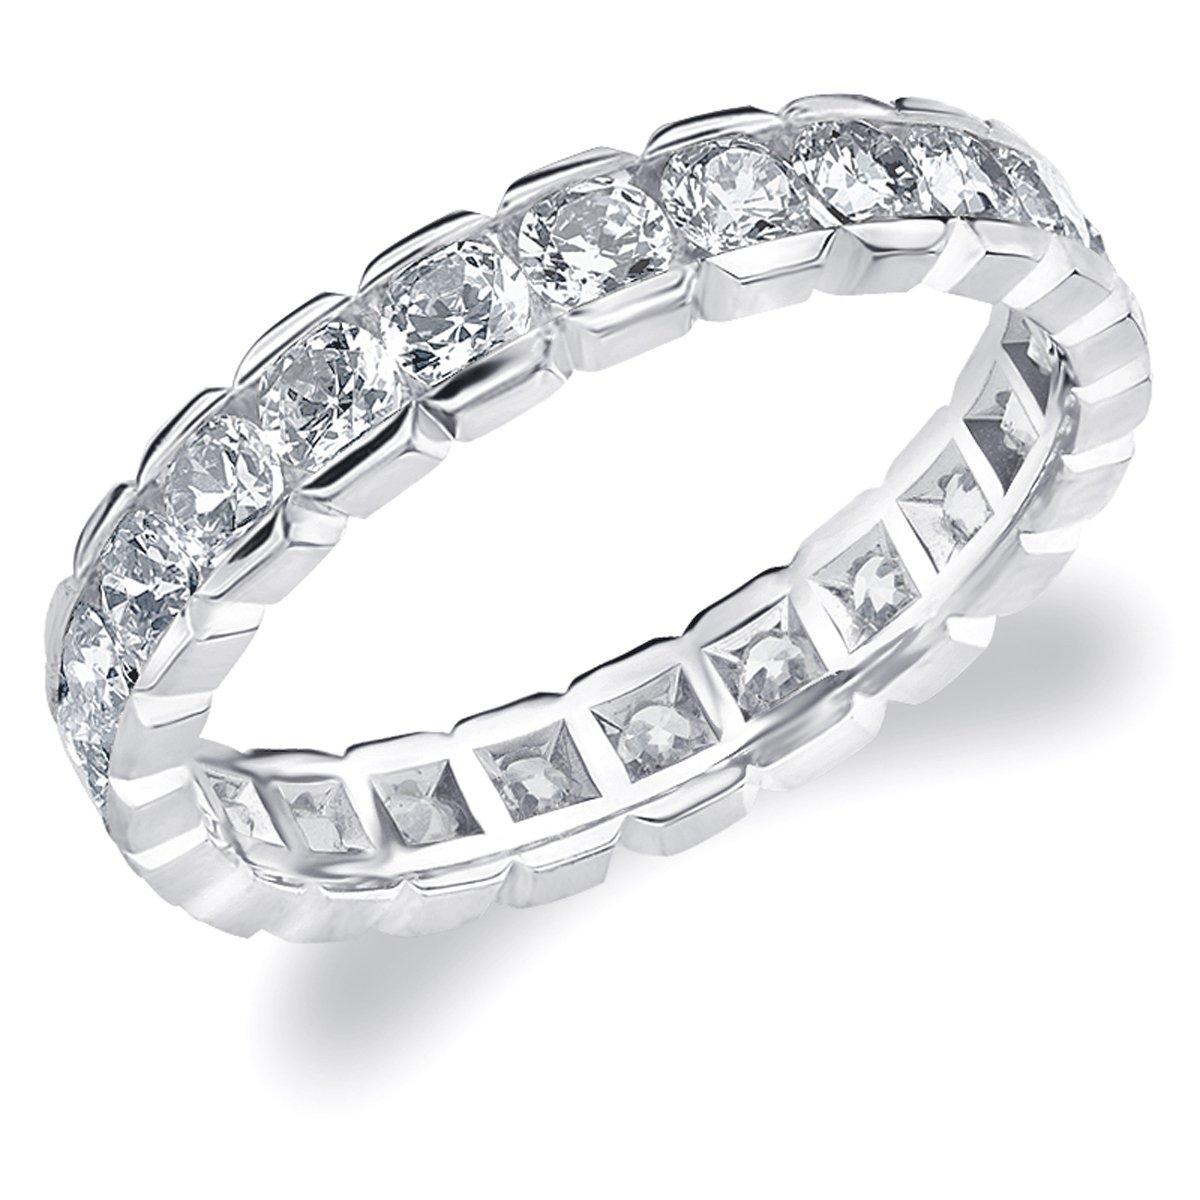 Eternity Wedding Bands 1.50 CTTW Diamond Eternity Ring, 1.5ct Wedding Anniversary Ring in 14K White Gold - Finger Size 9.5